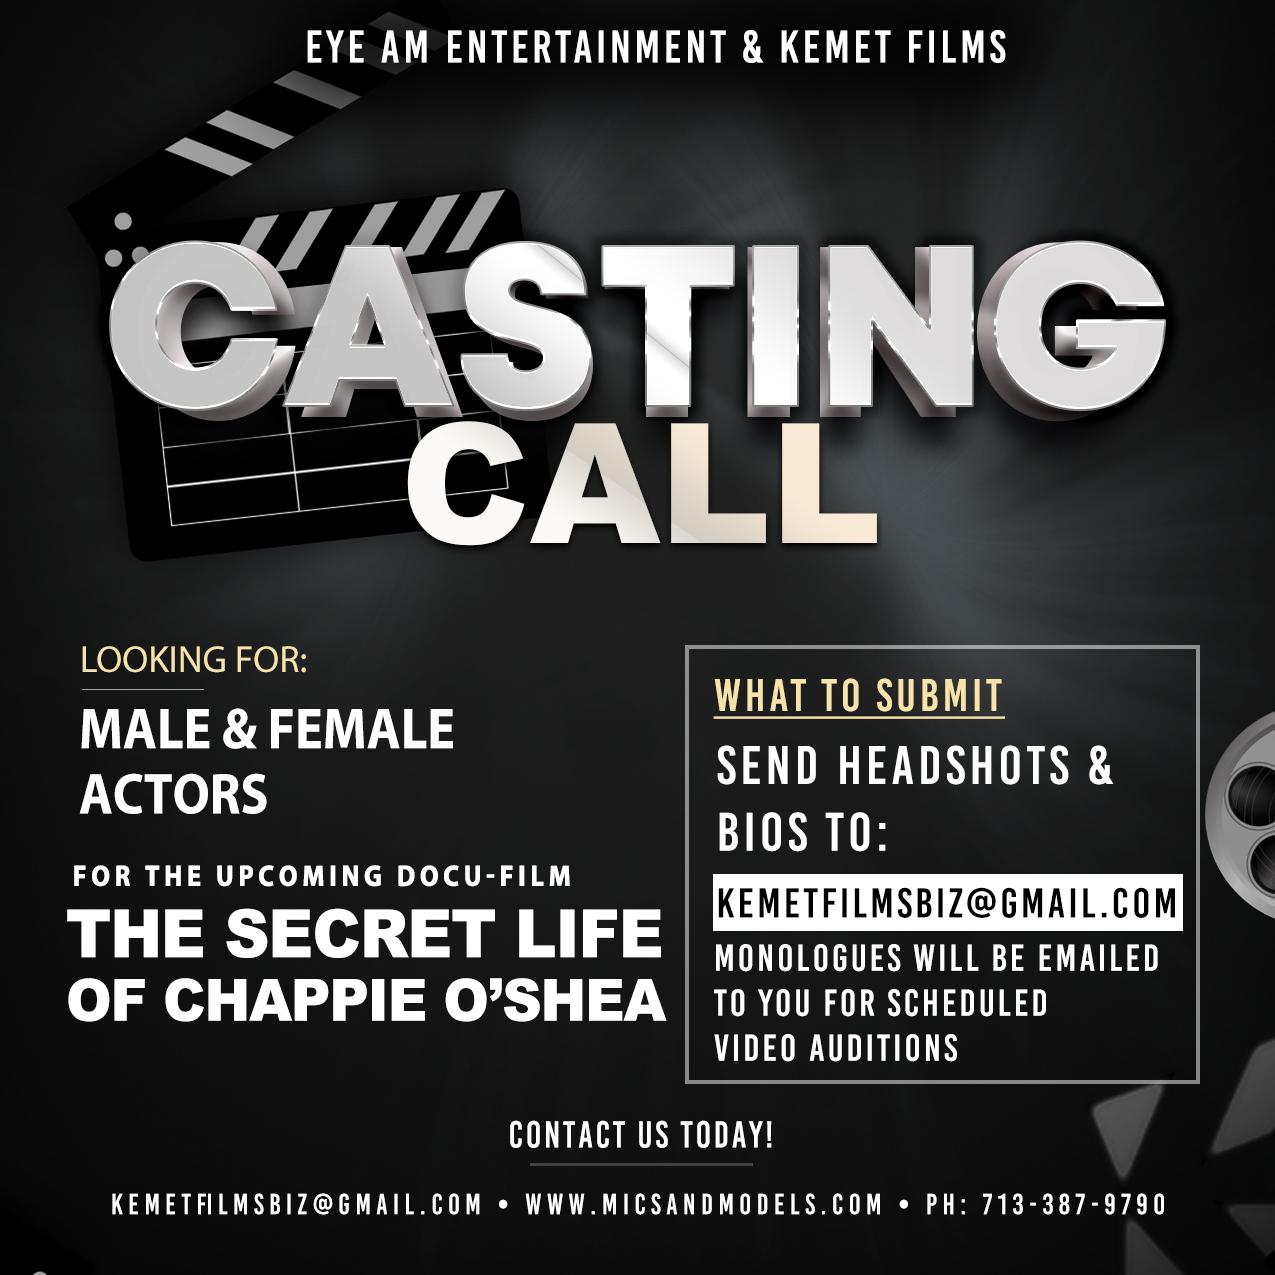 THE SECRET LIFE OF CHAPPIE O'SHEA - Cast